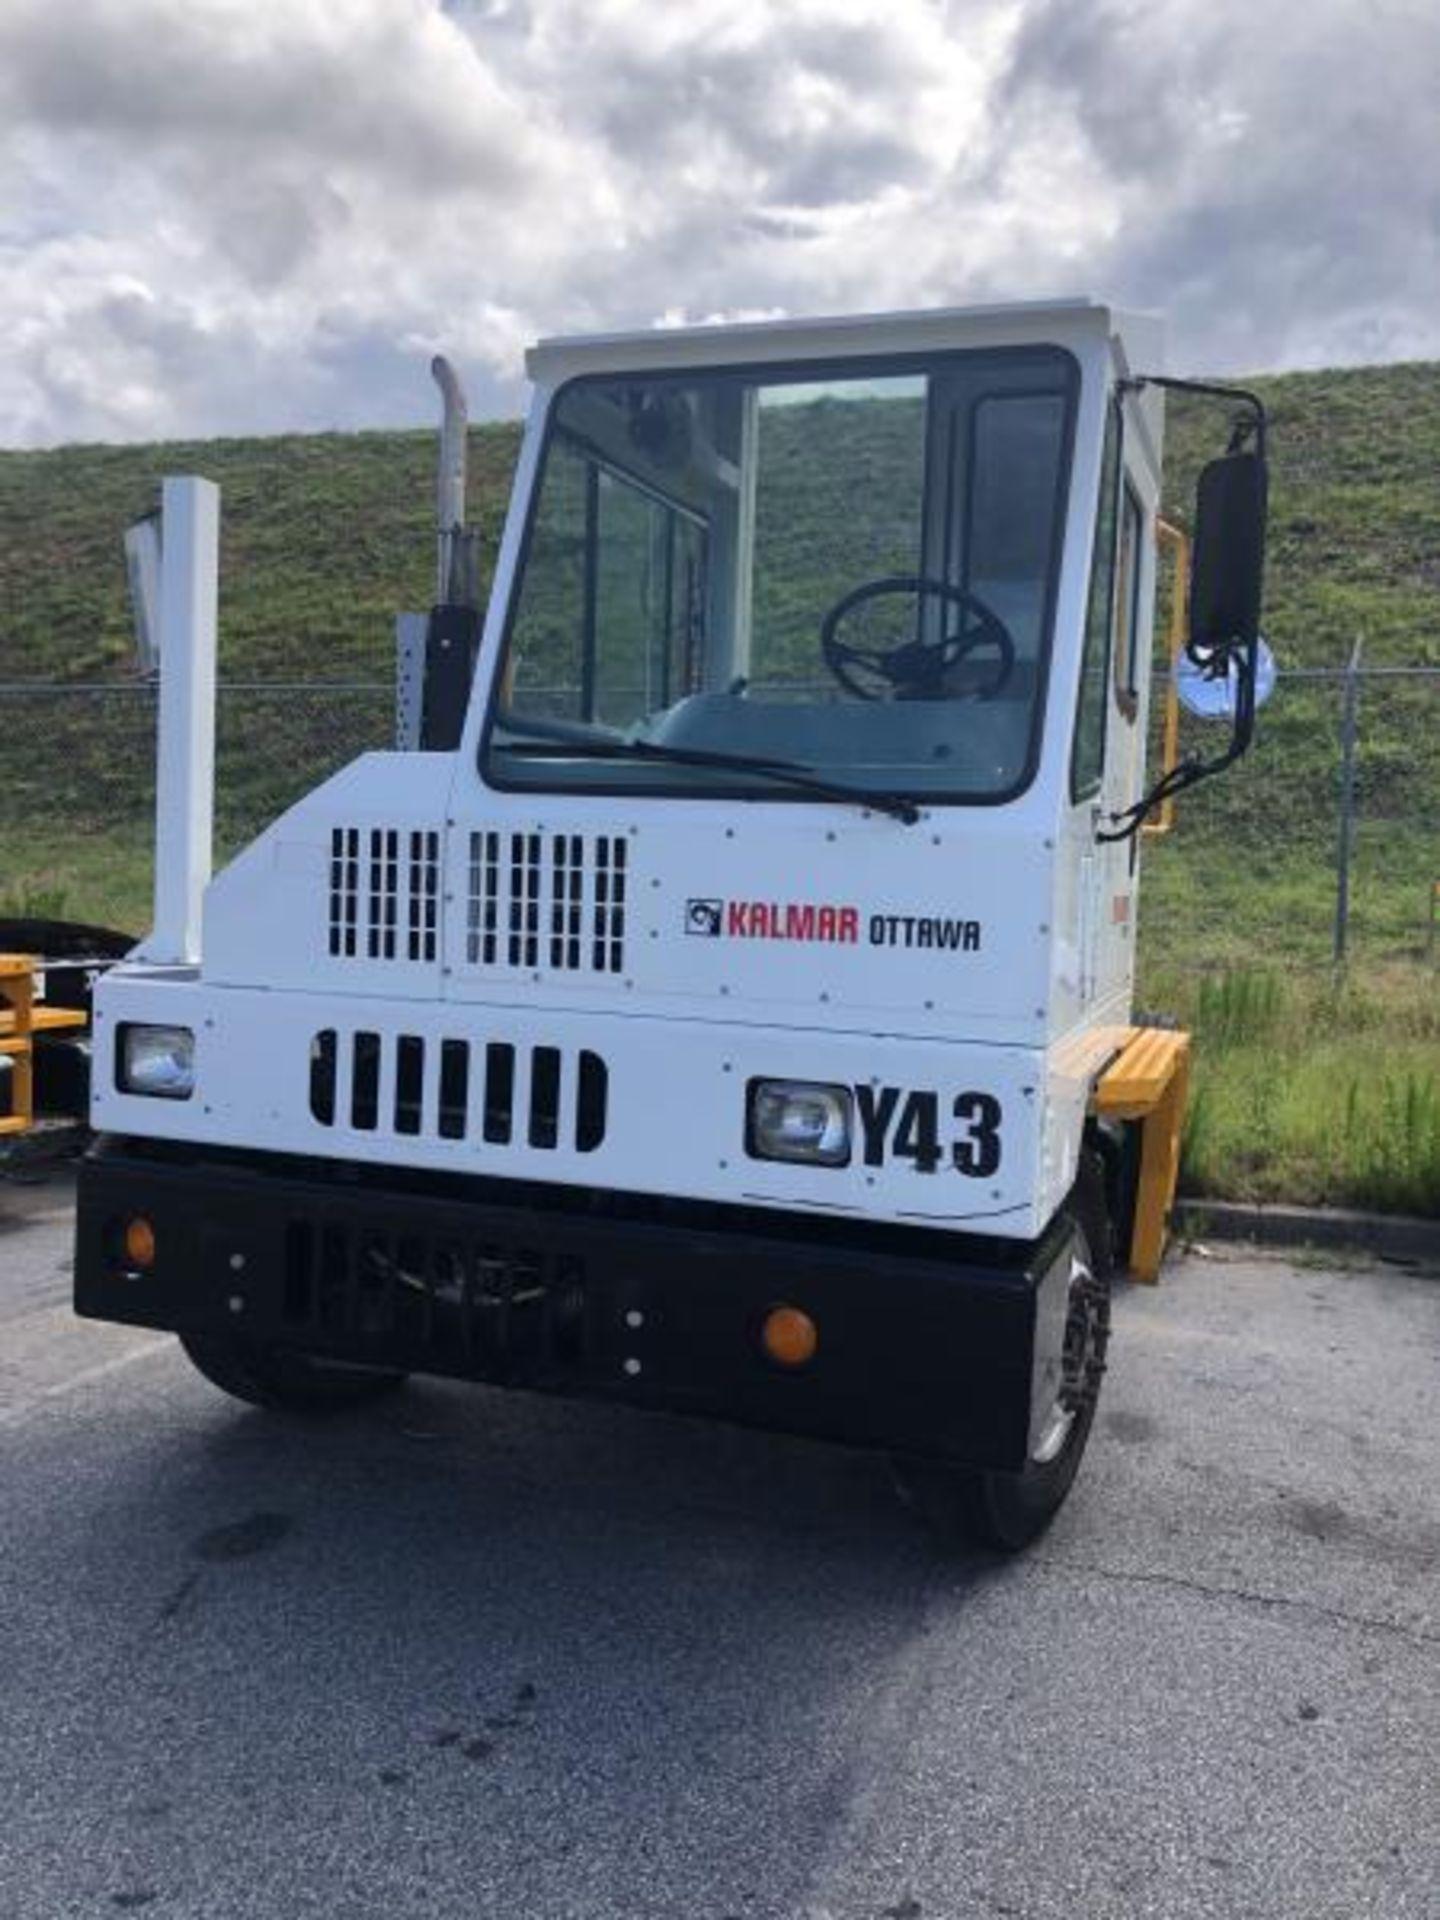 2015 Kalmar Ottawa 4x2 Yard Truck , SN: 338837 3,239.3 Hours, 3,125 Miles - Image 4 of 32